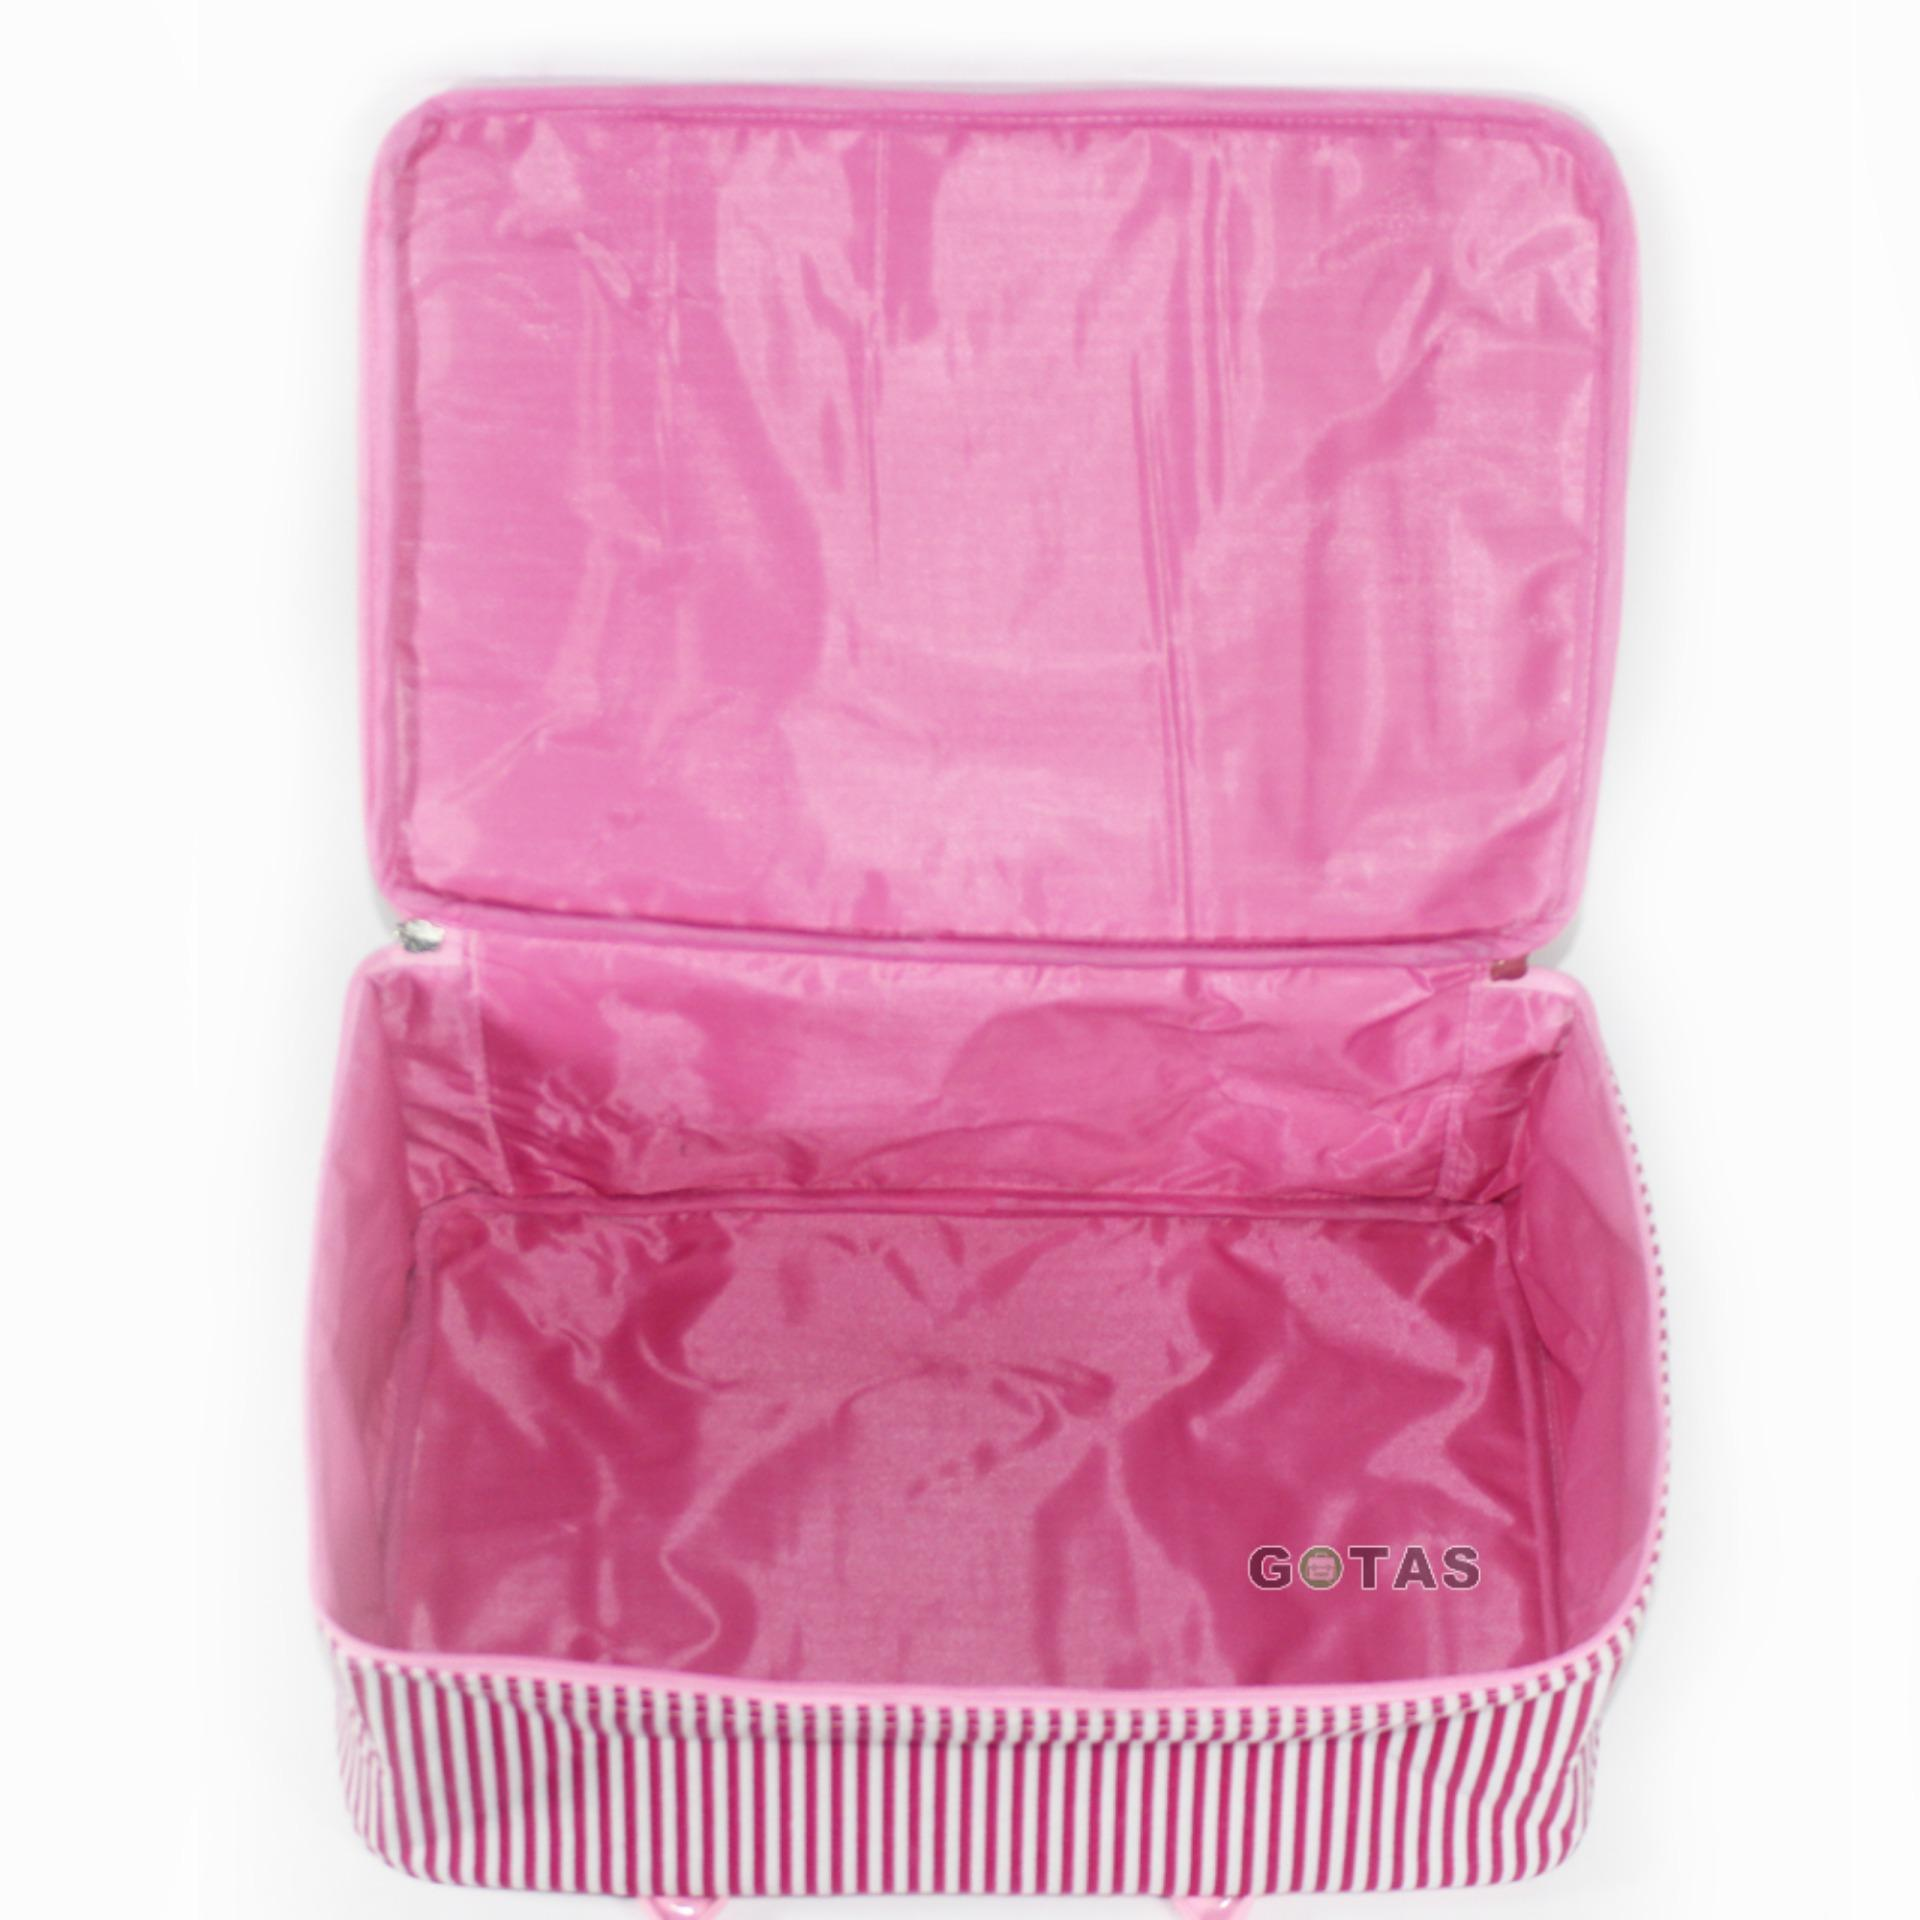 Gambar Produk Rinci Travel Bag Koper Tas Kanvas Karakter Hello Kitty Ukuran Besar Terkini